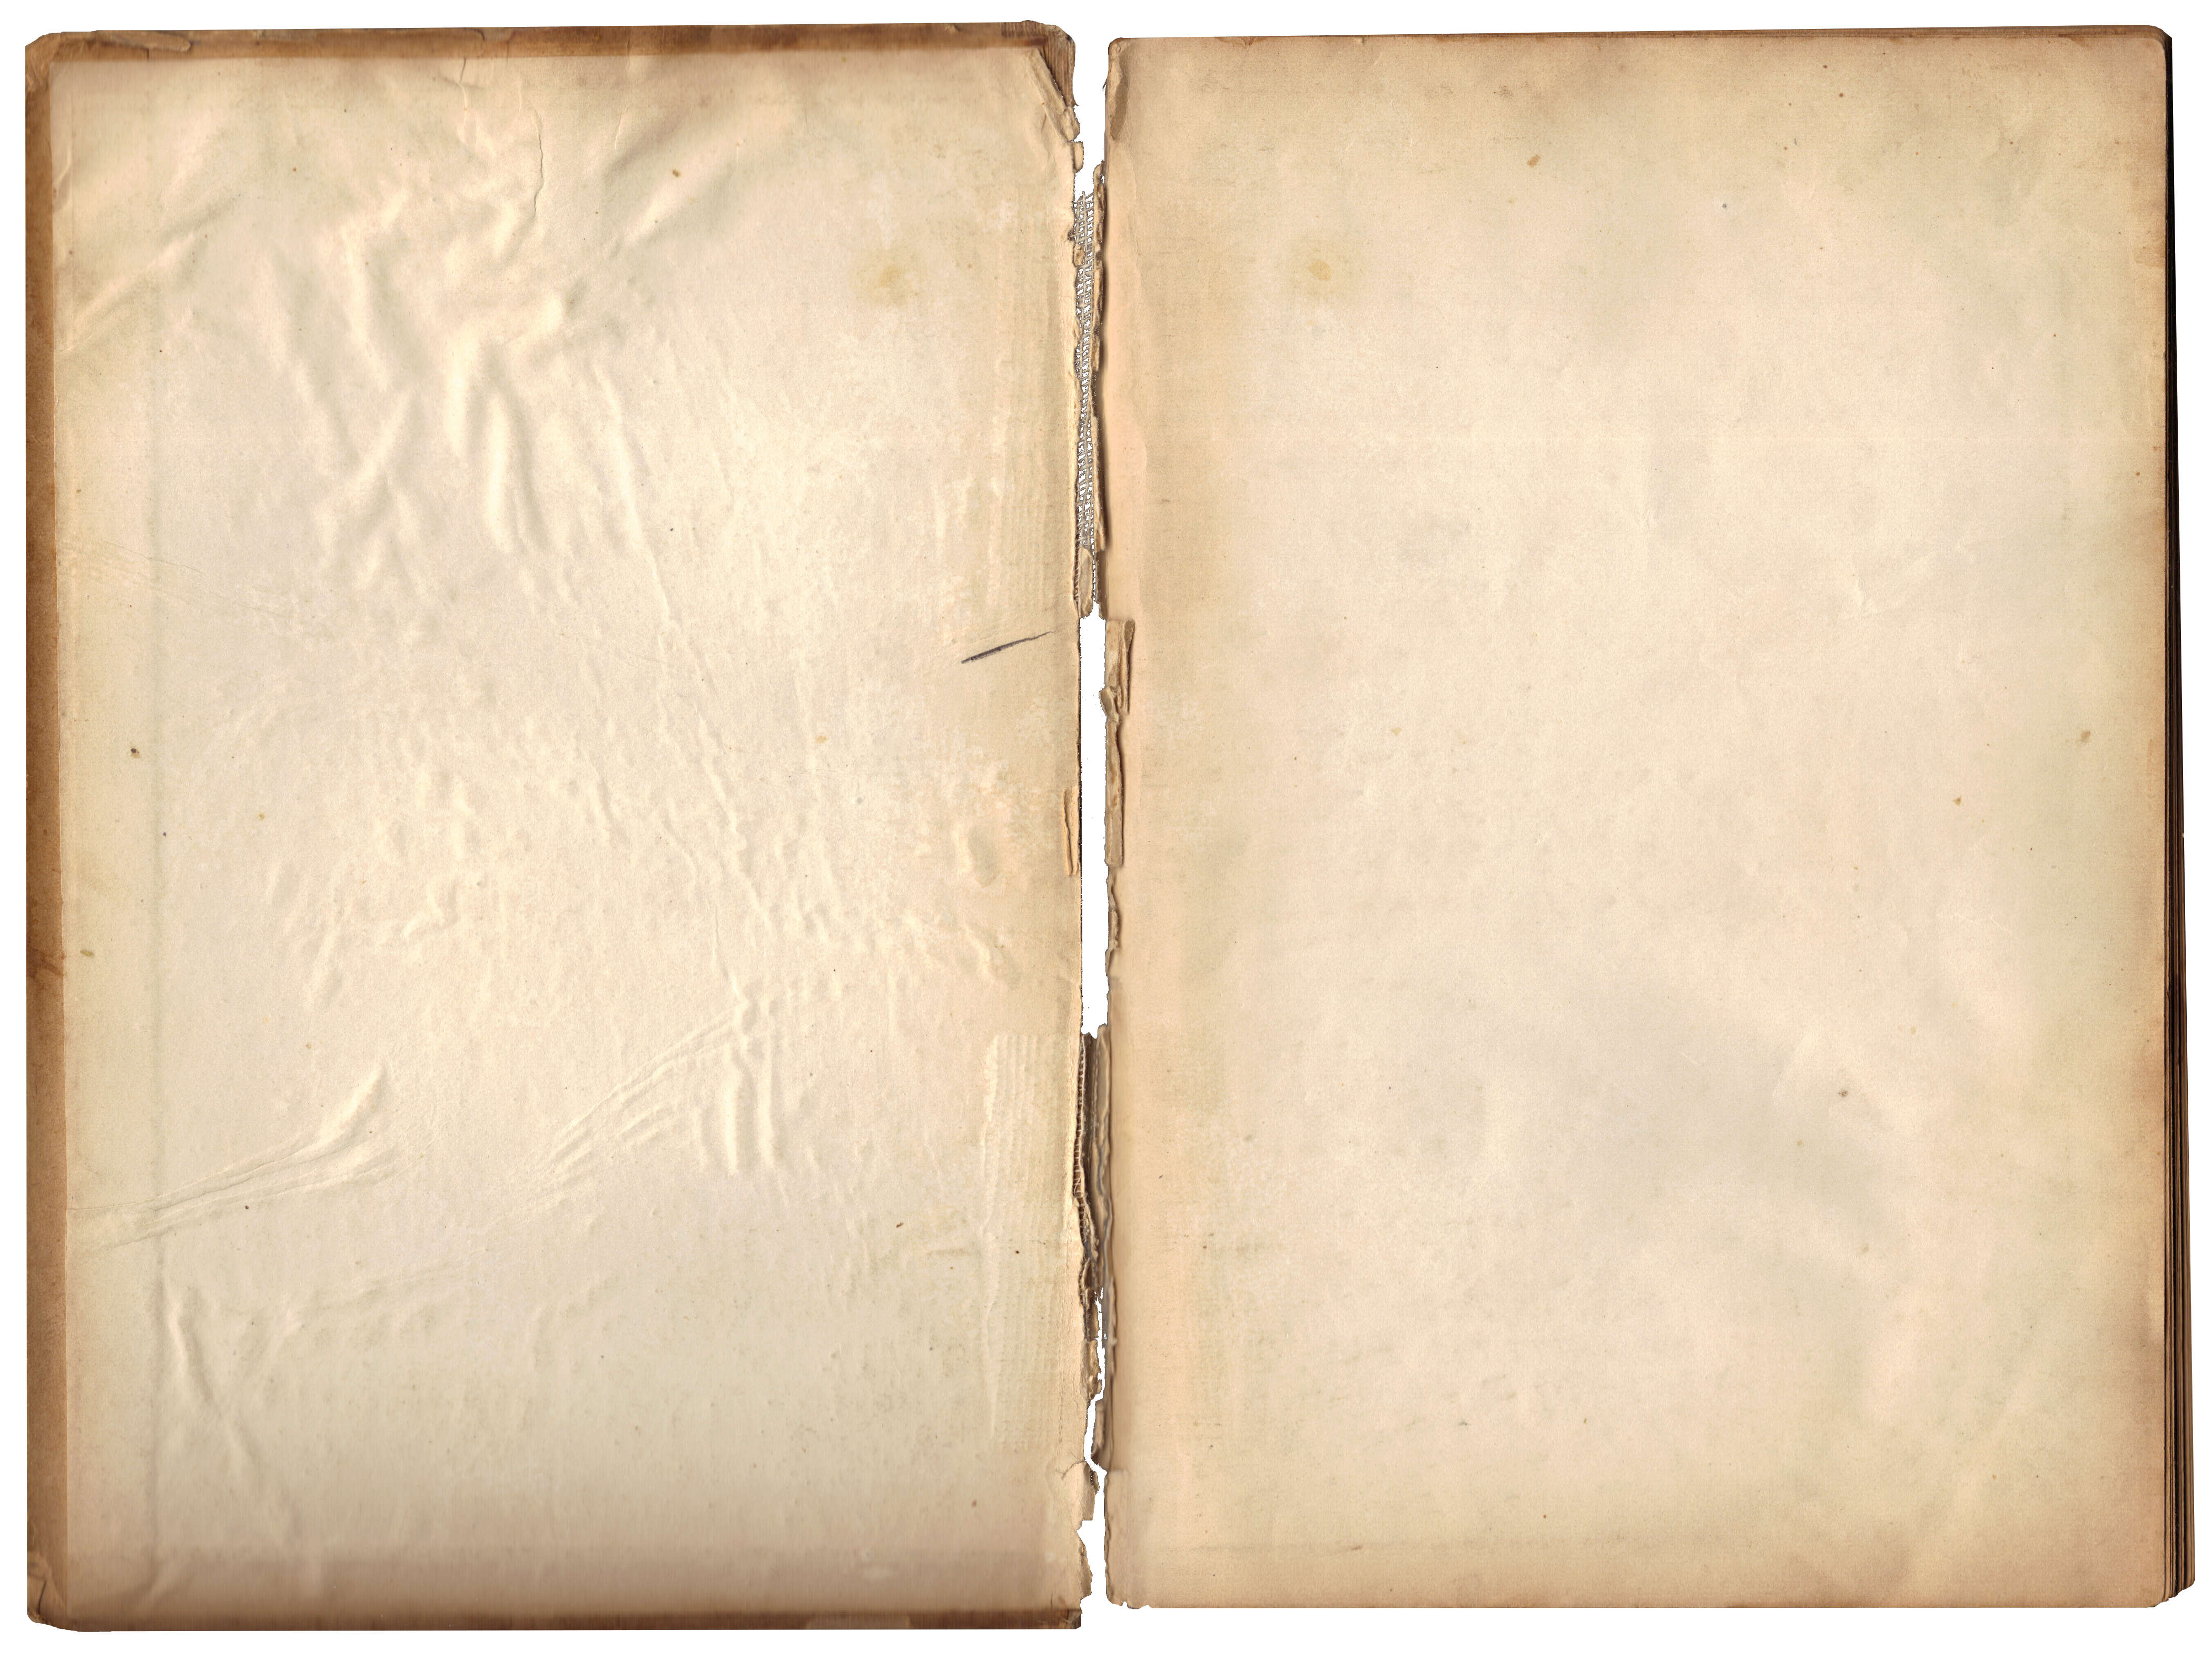 7 old book open textures jpg onlygfx com